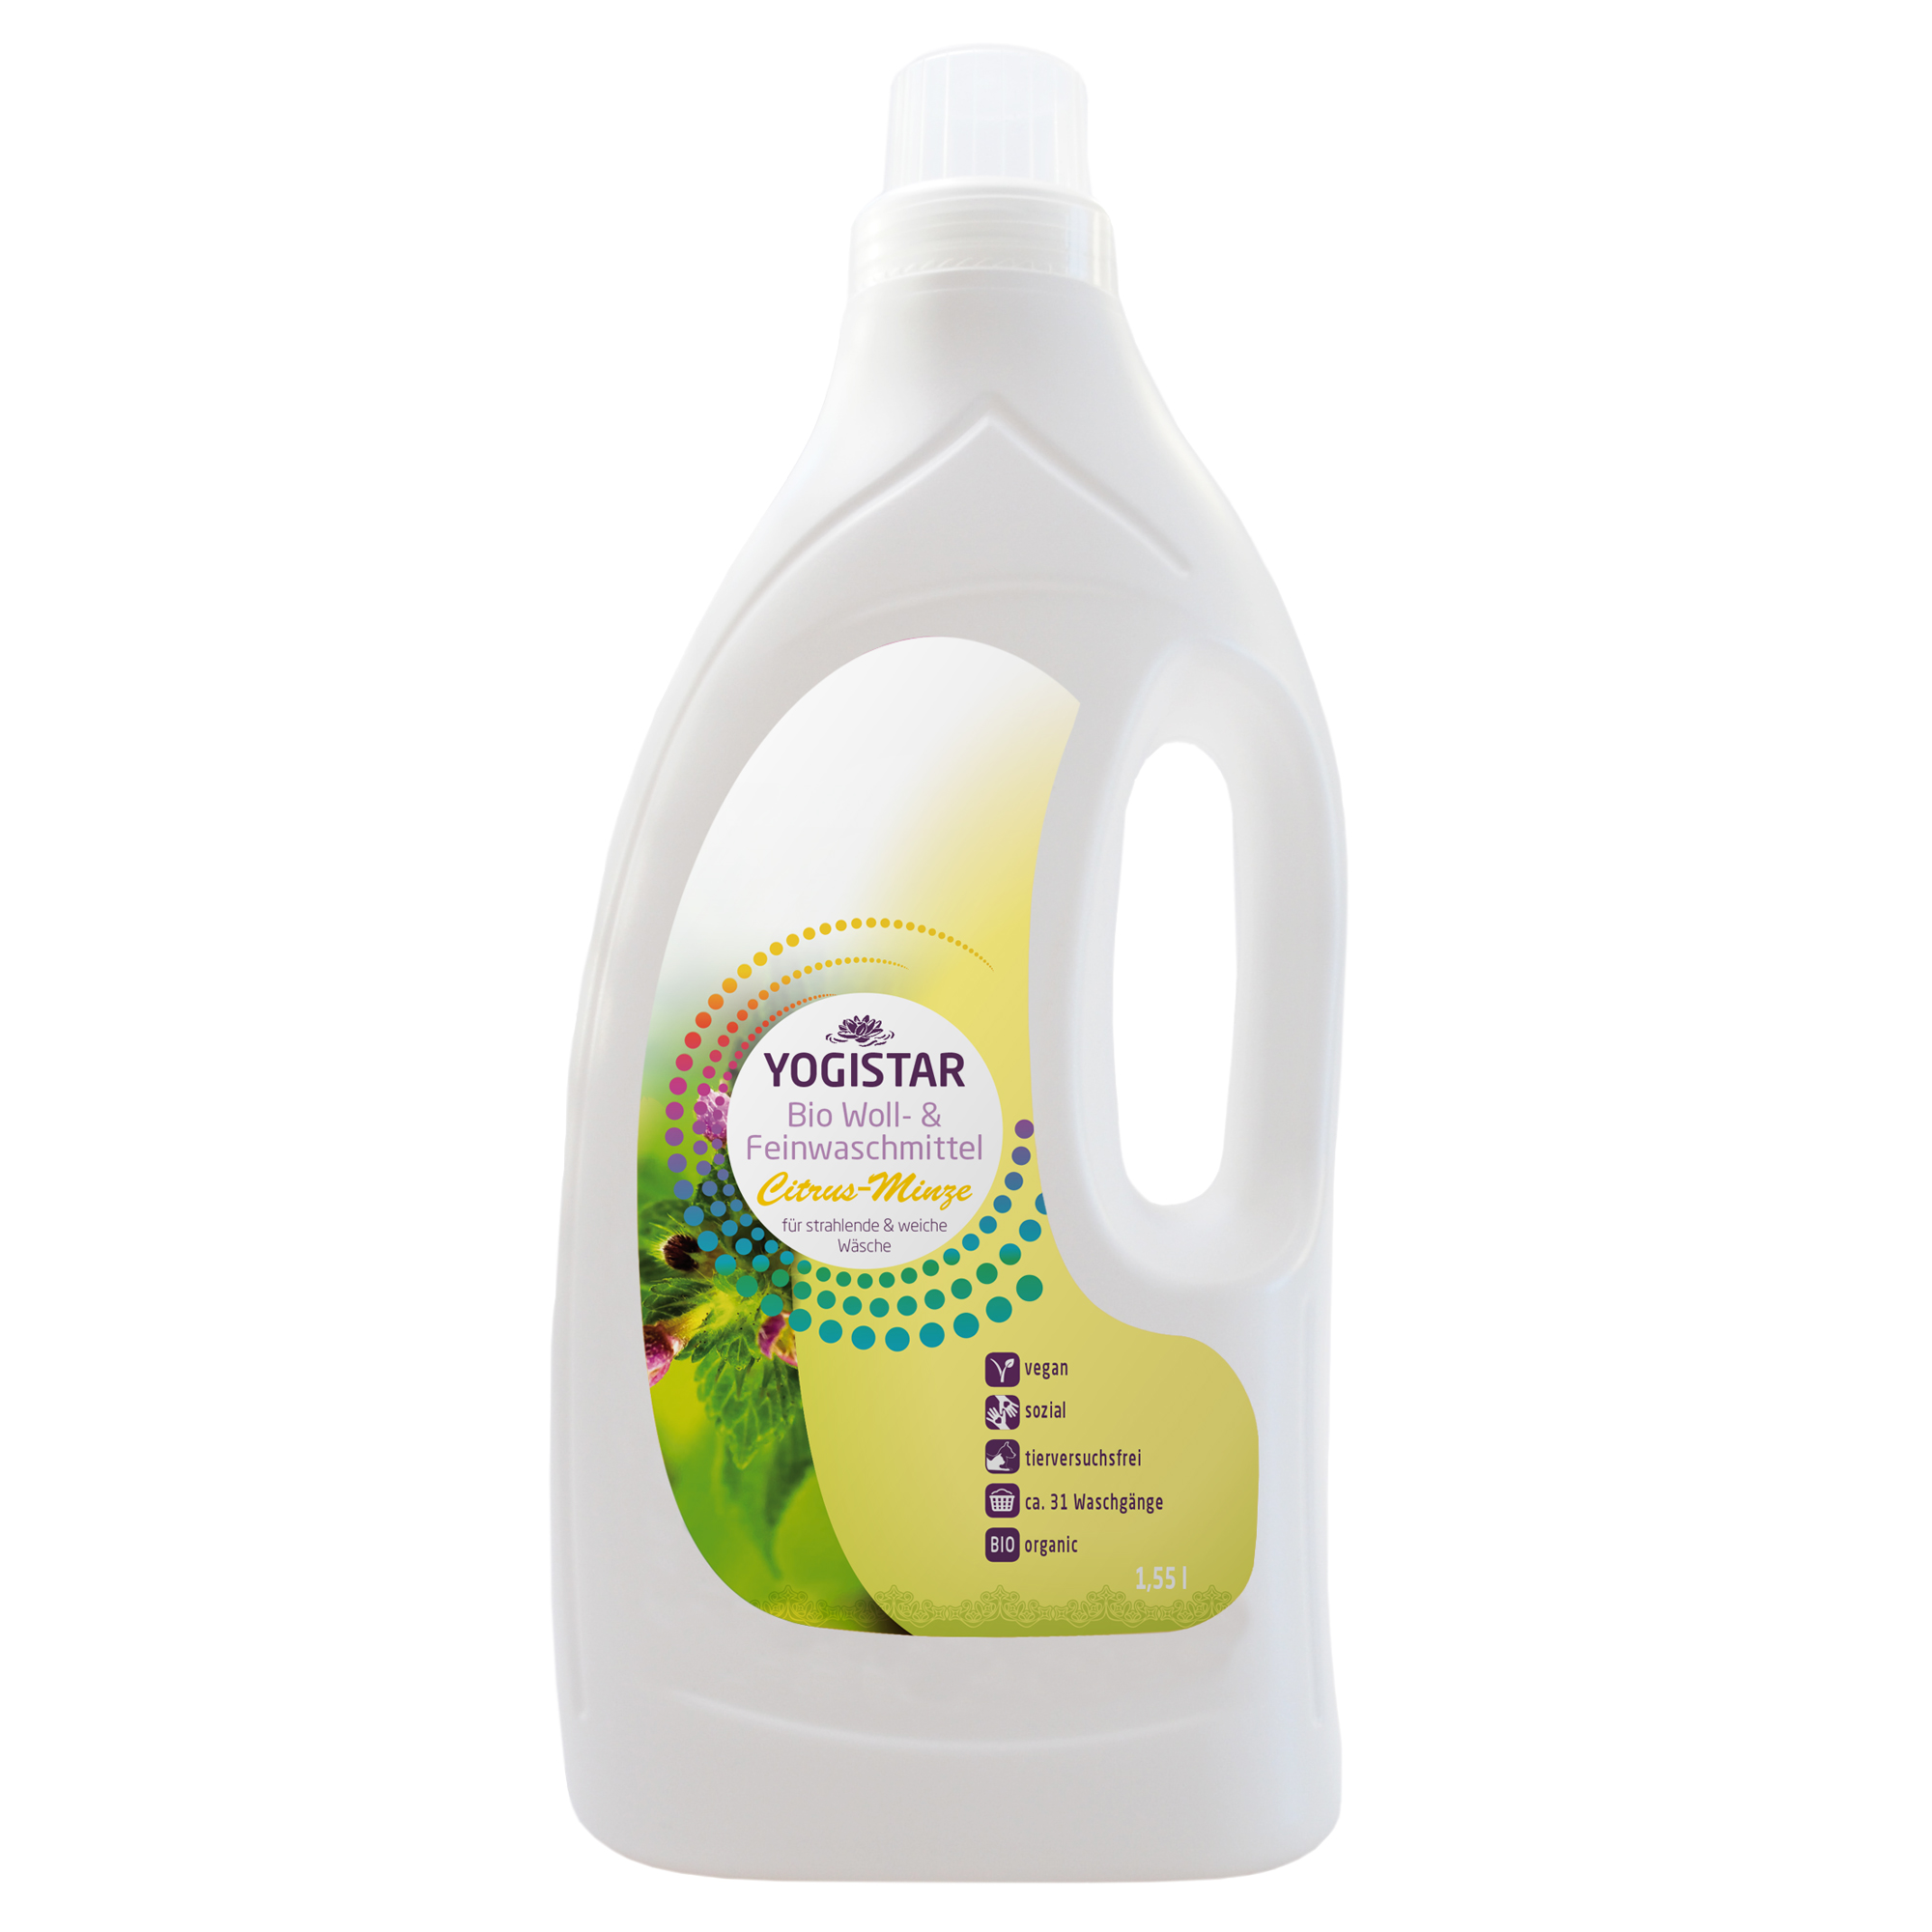 Bio Woll- & Feinwaschmittel - Citrus-Minze - 1,55 l